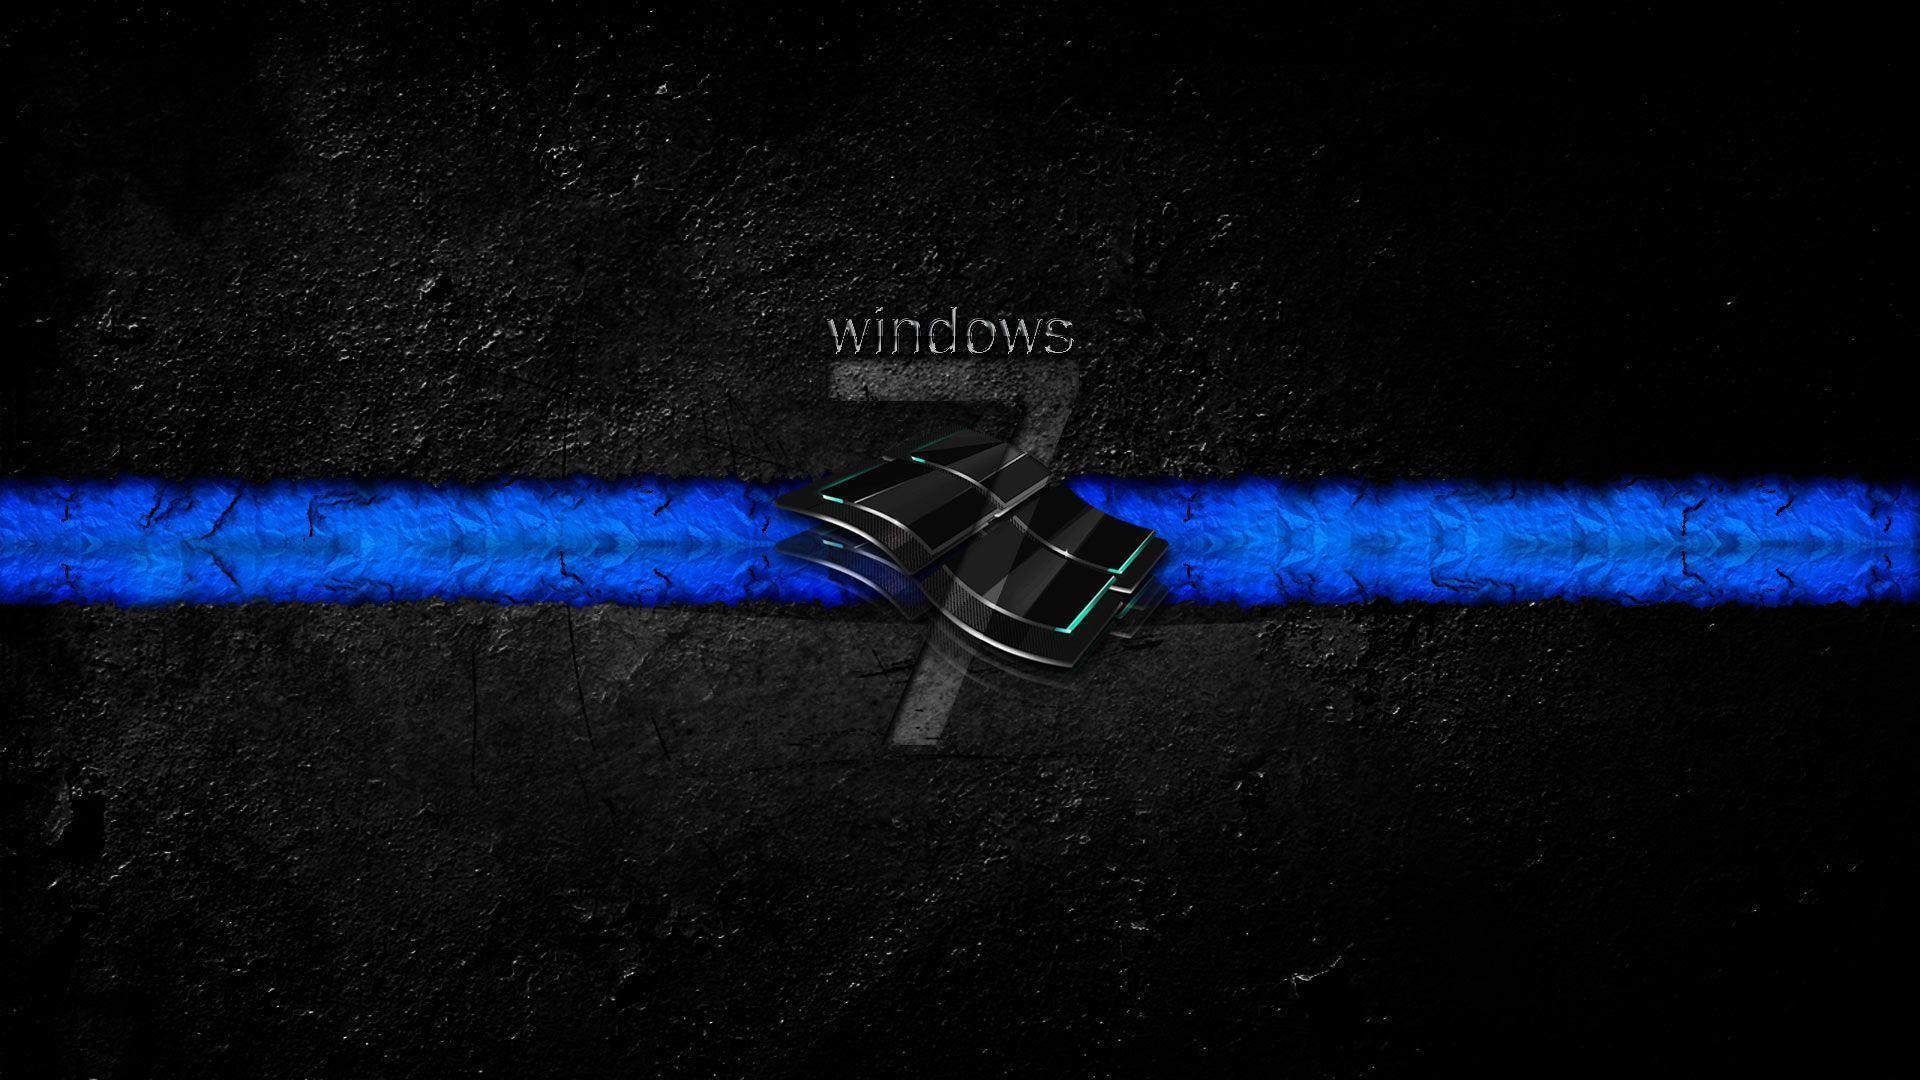 Windows 7 Hd Wallpapers Wallpaper Cave